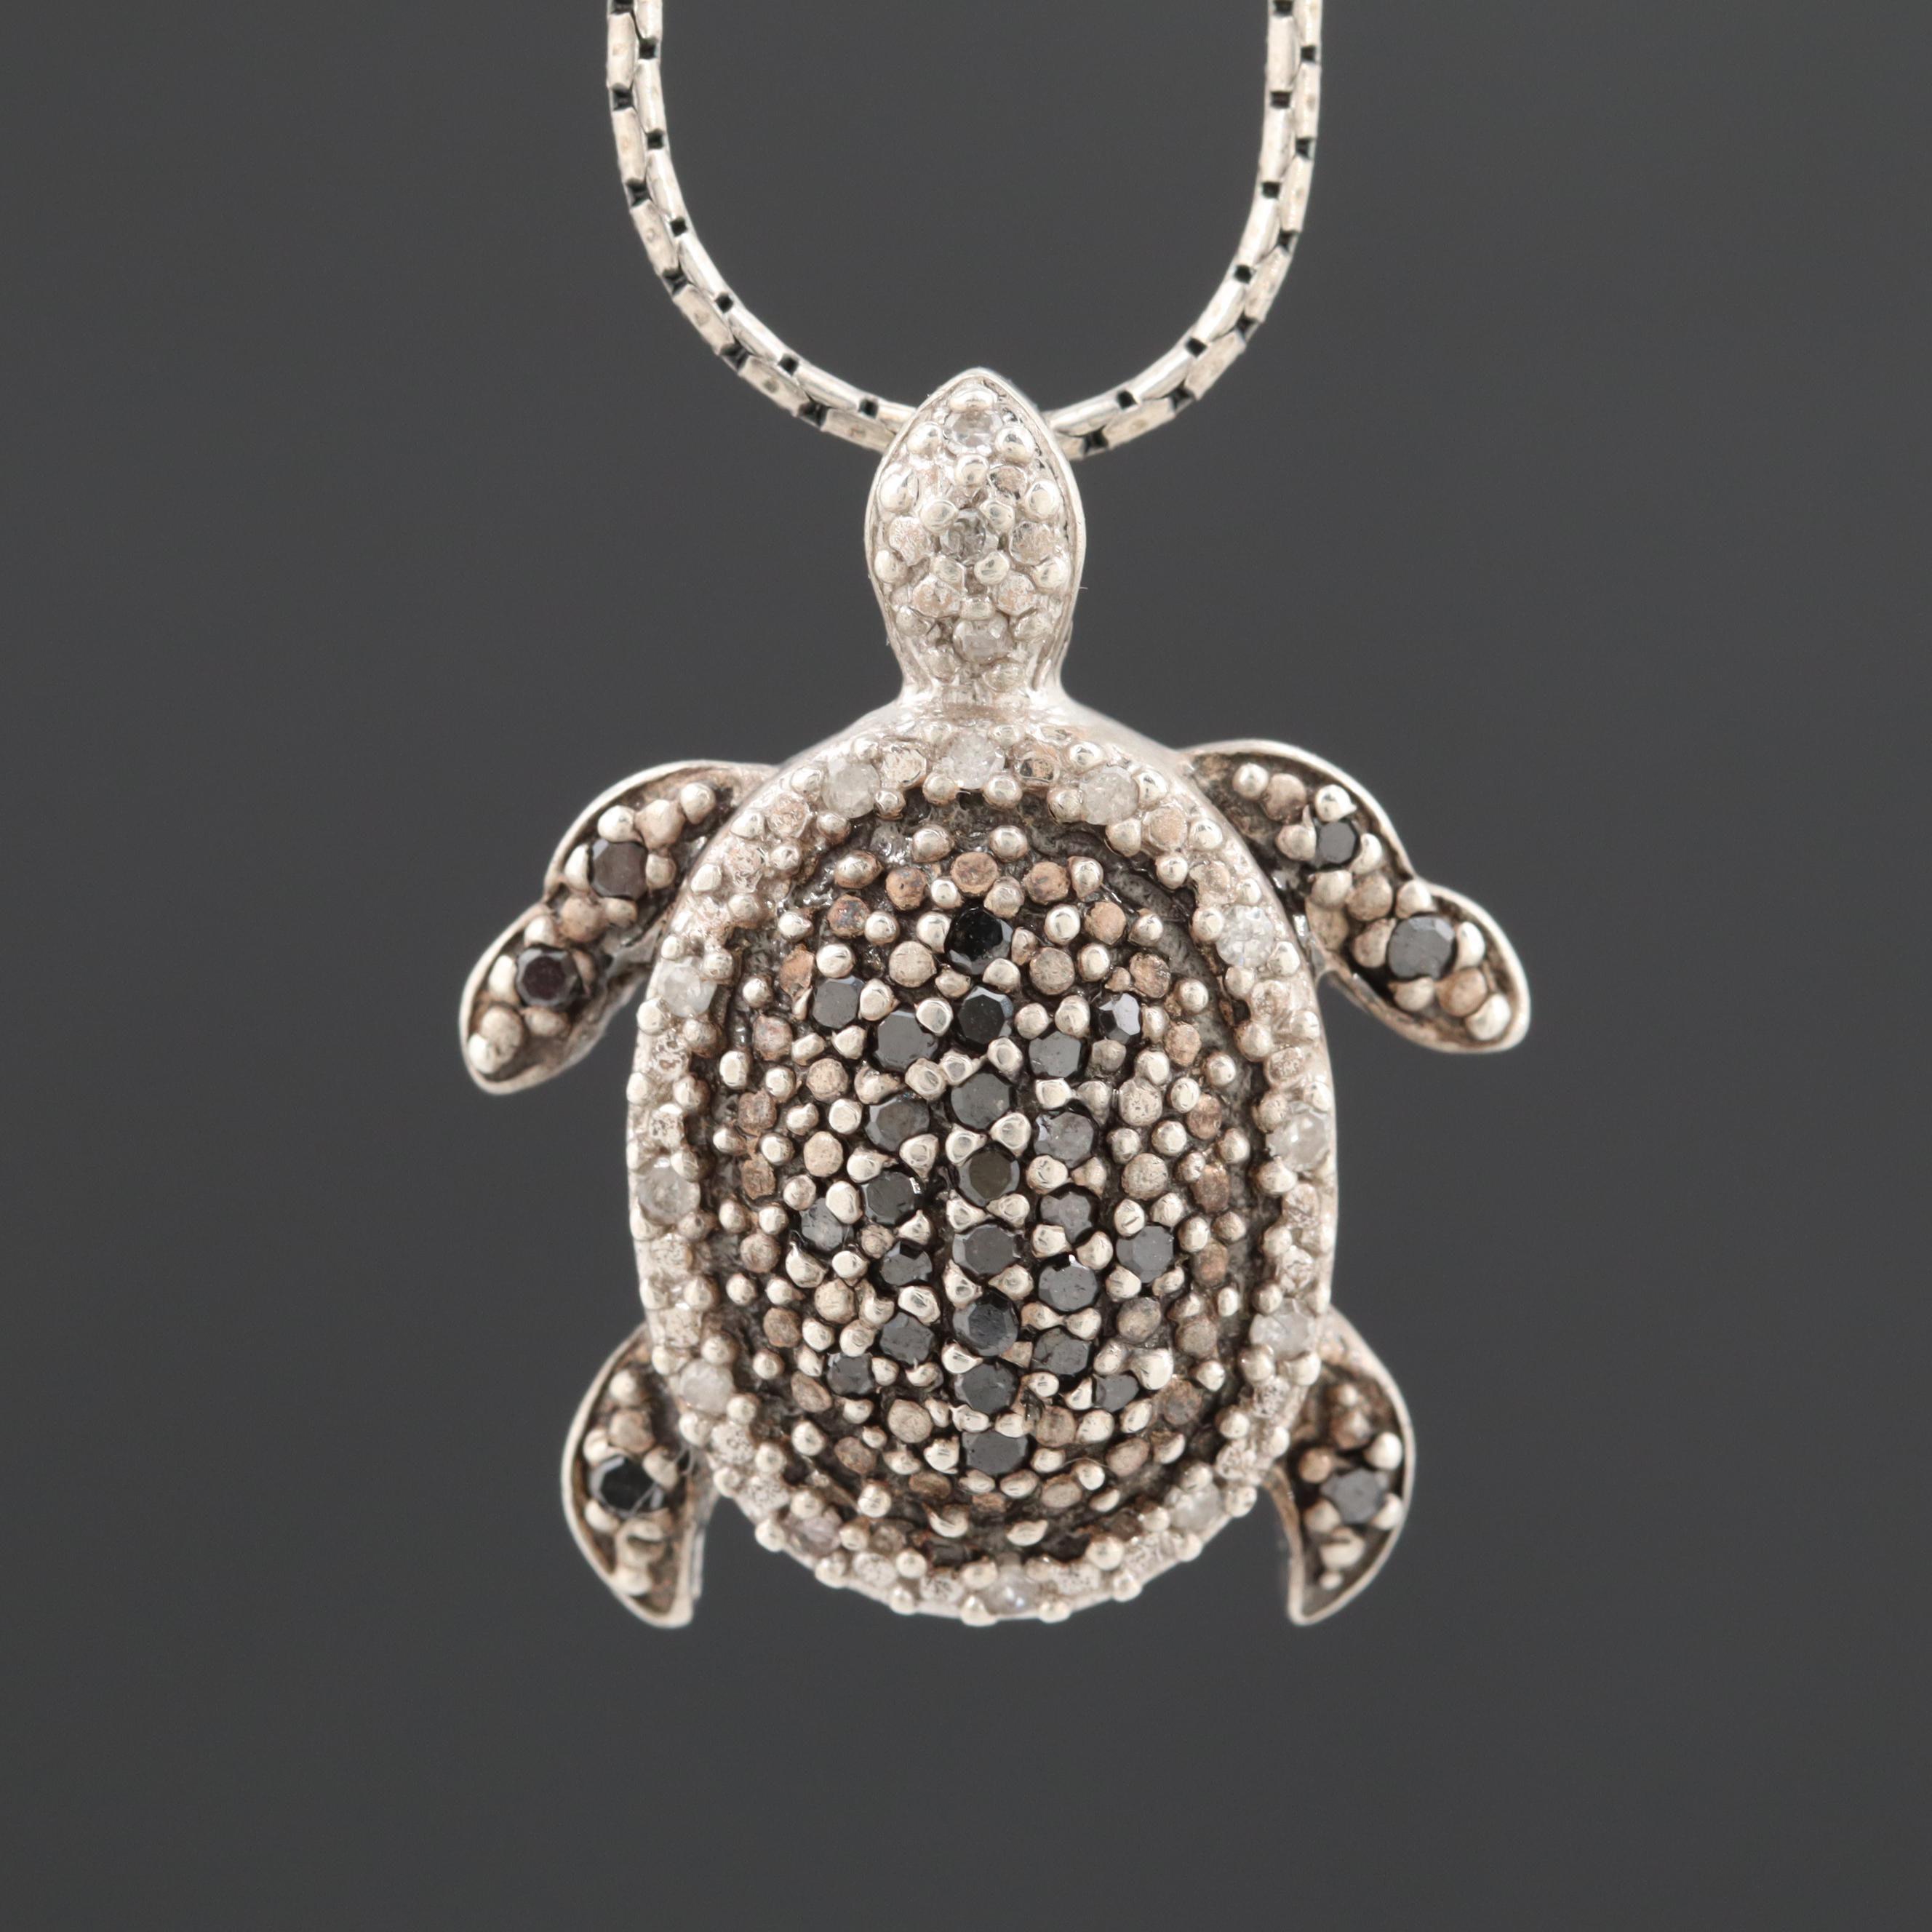 Sterling Silver Turtle Diamond Pendant Necklace with Black Diamonds